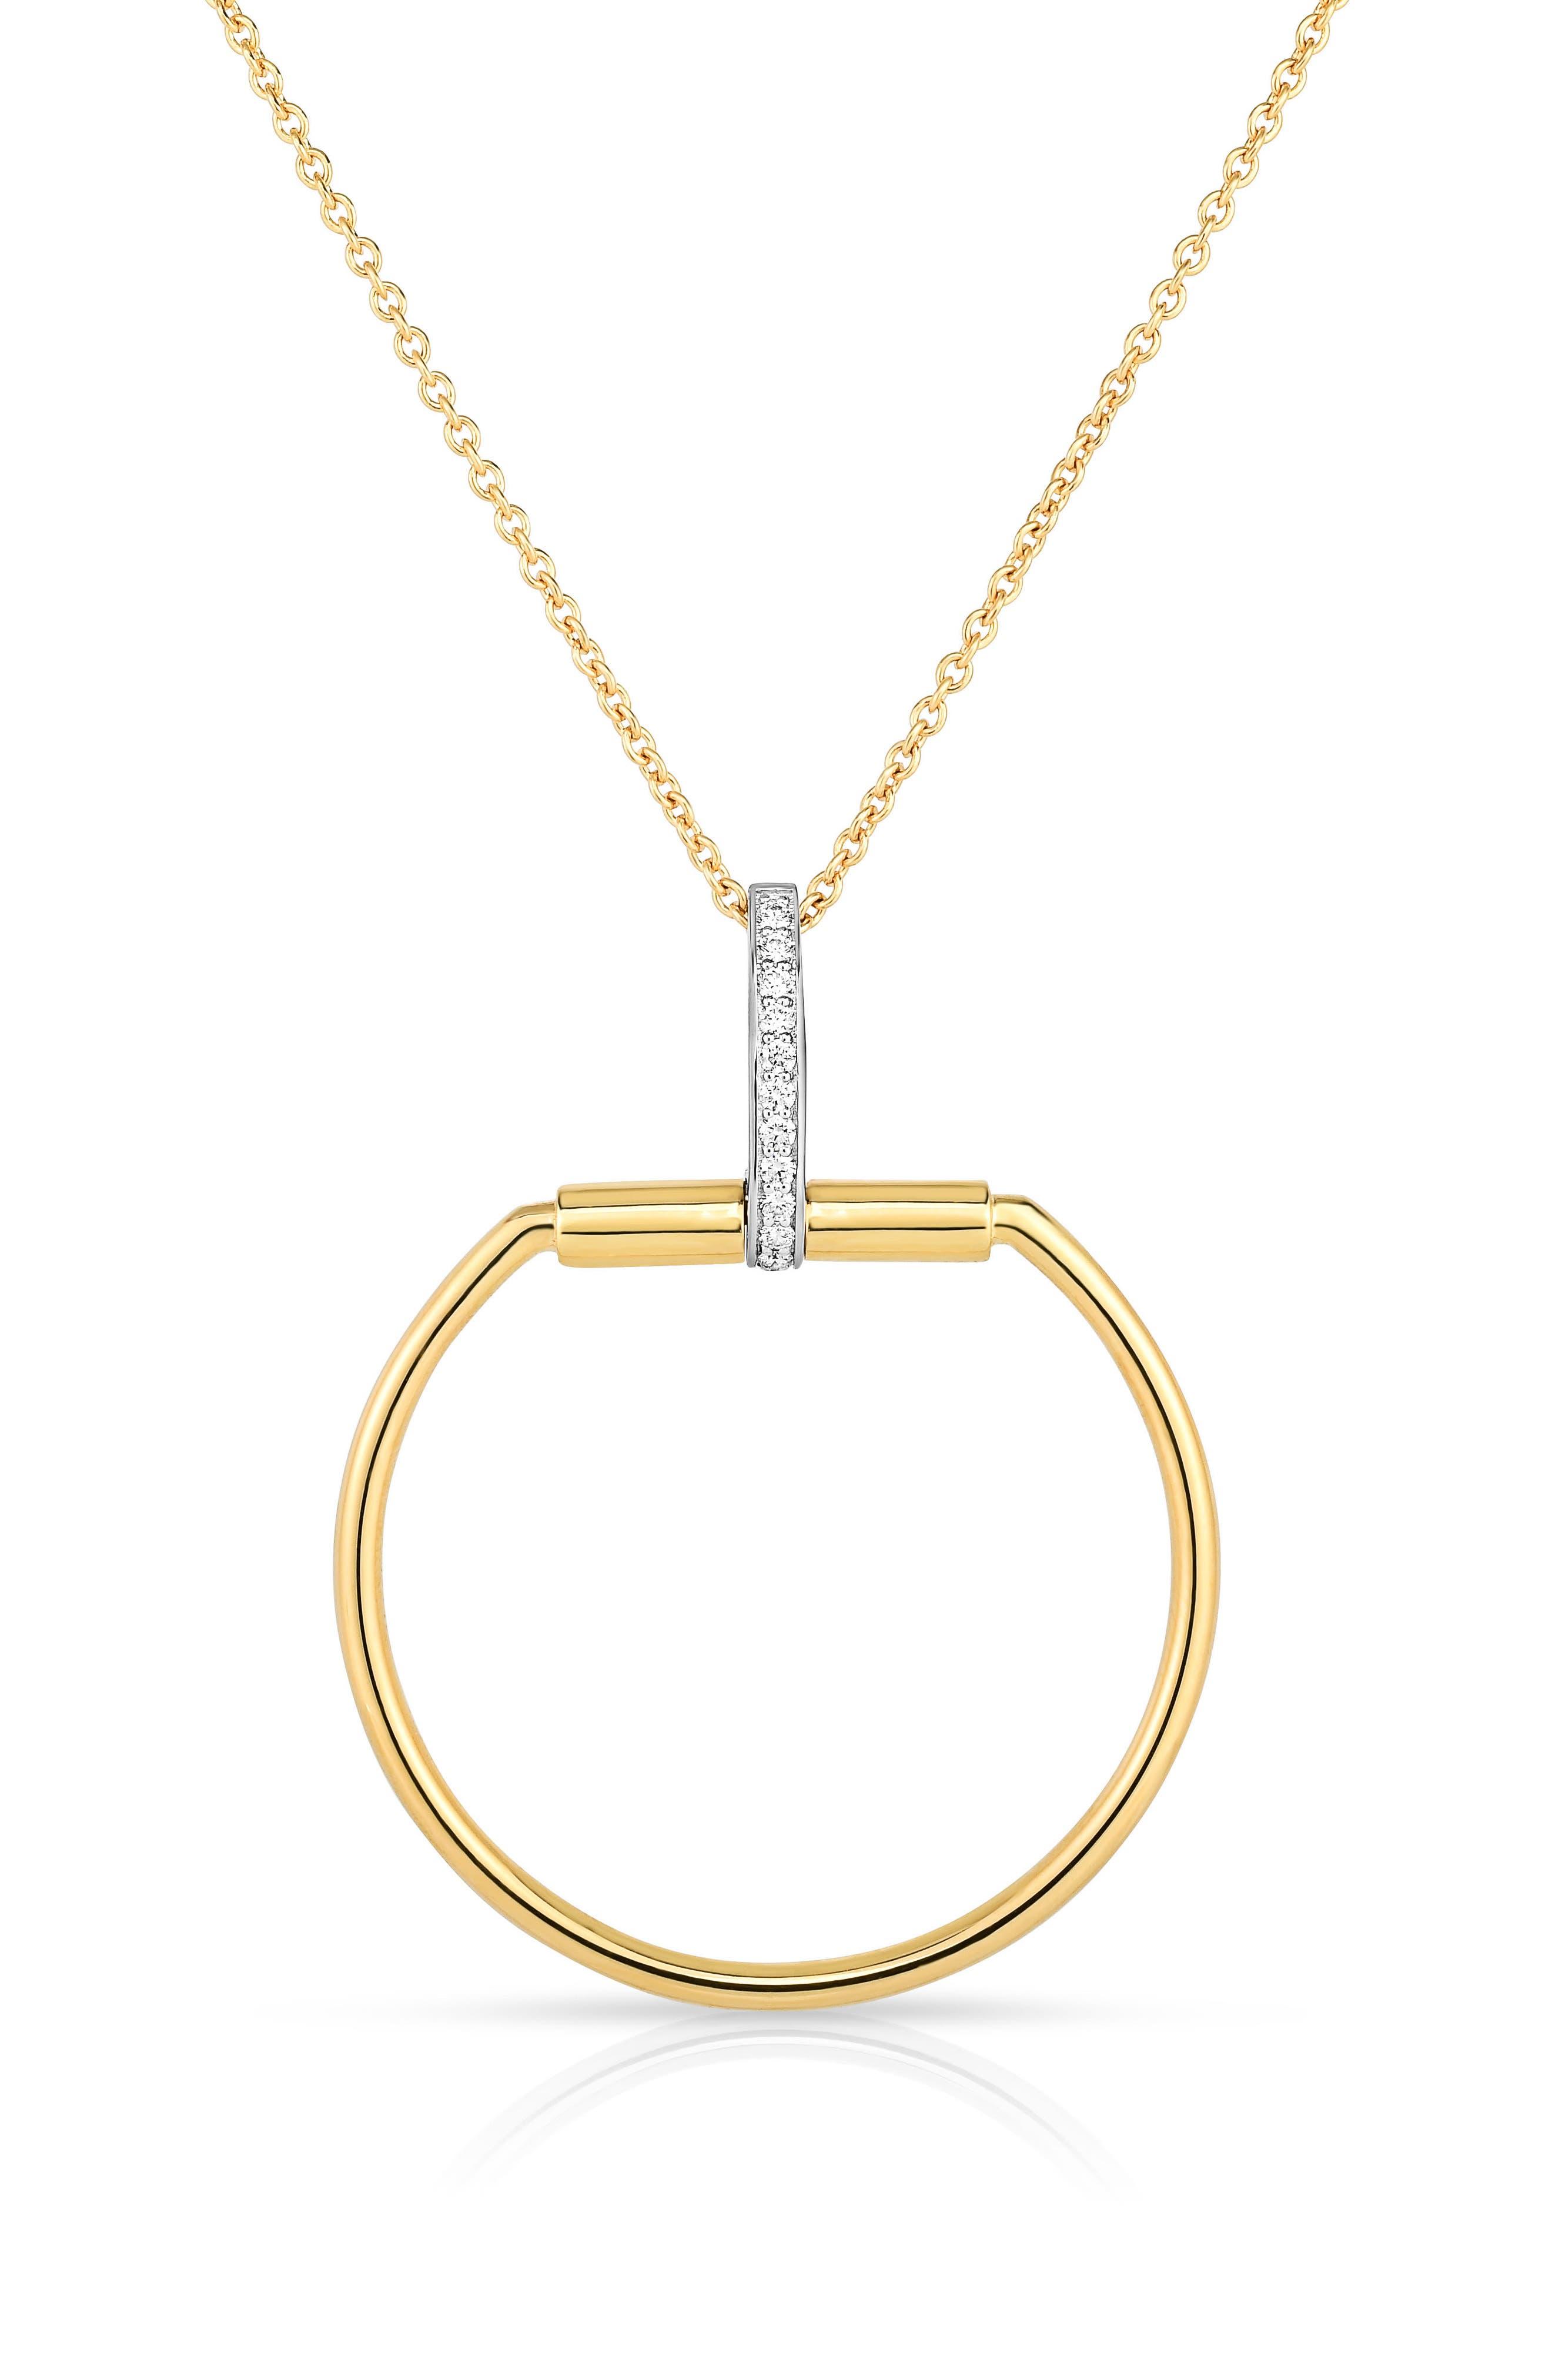 Roberto Coin Classica Parisienne Diamond Pendant Necklace